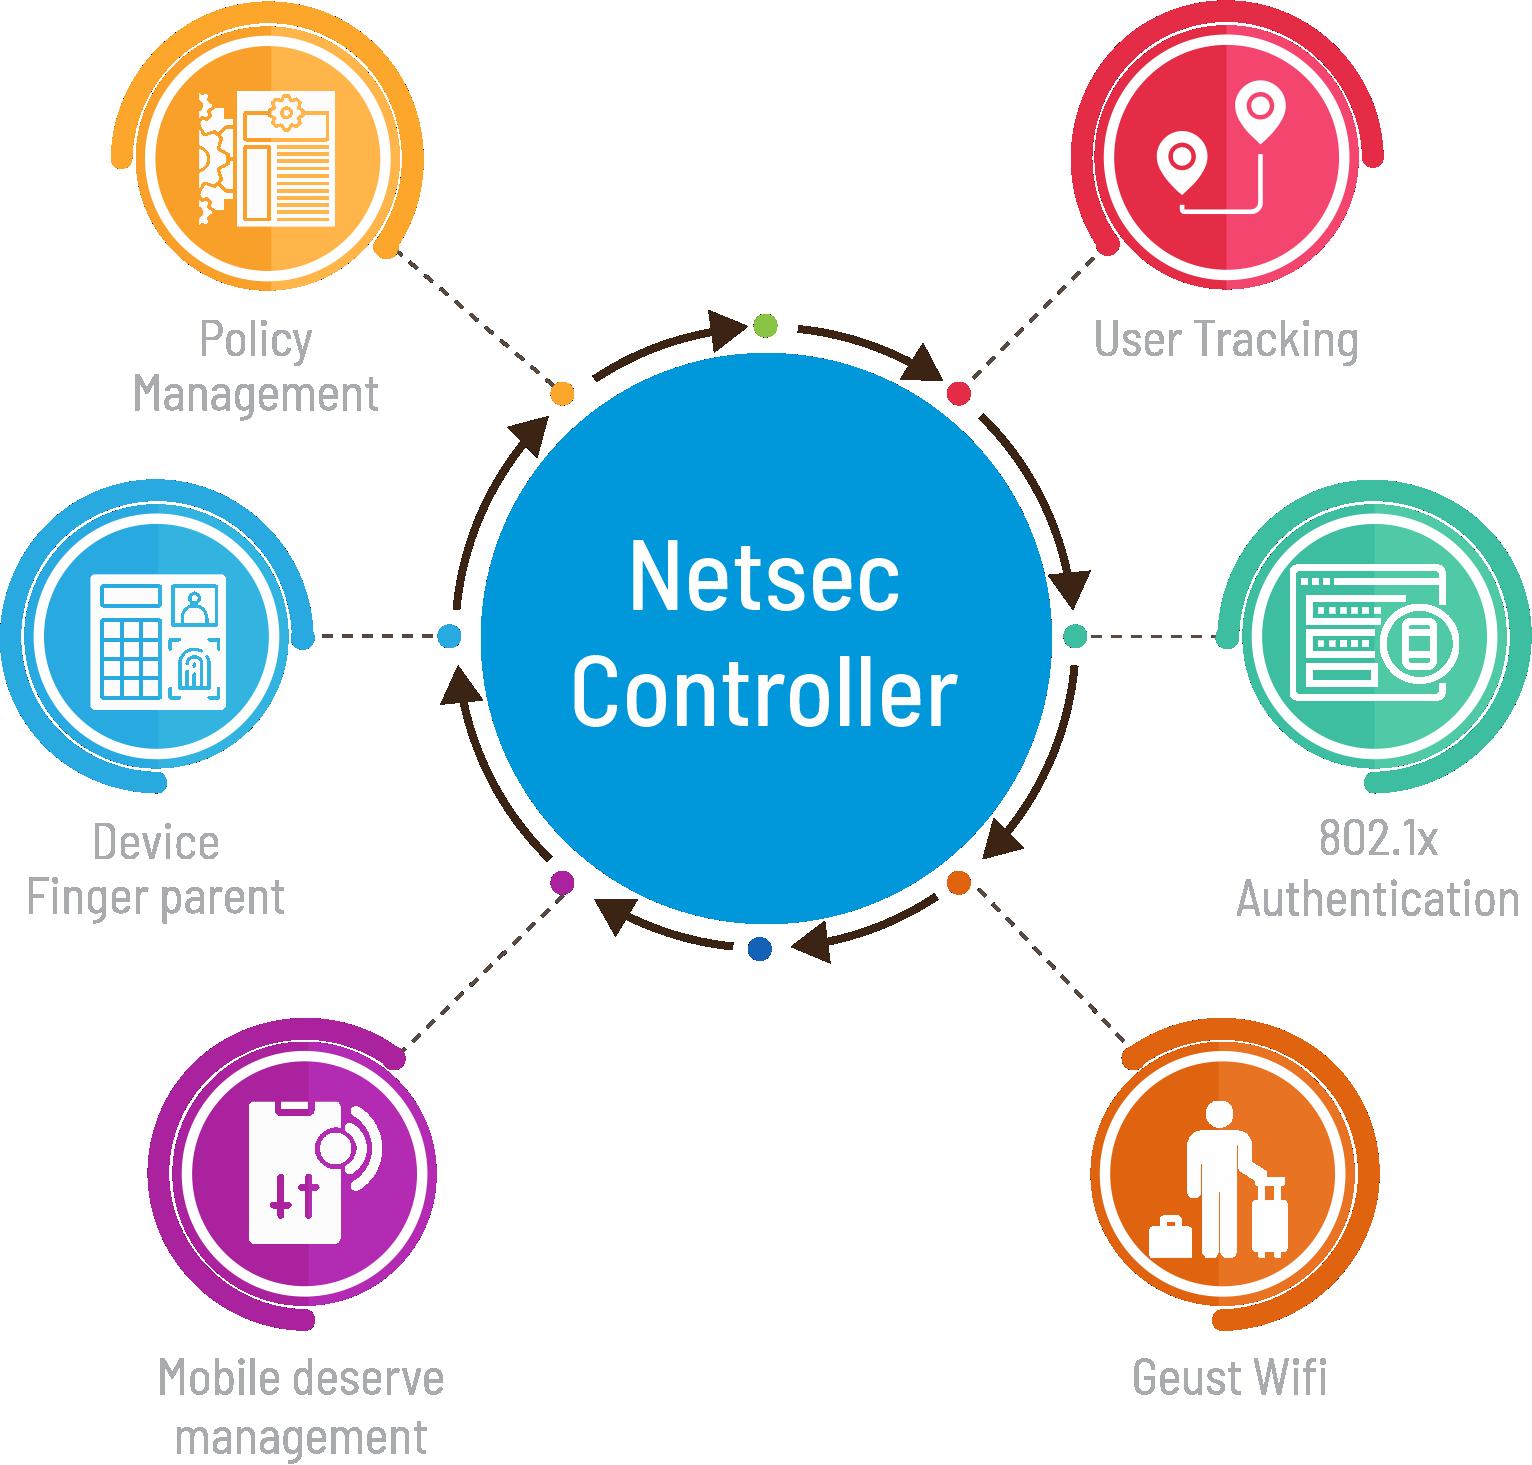 WifiSoft - Netsec Controller